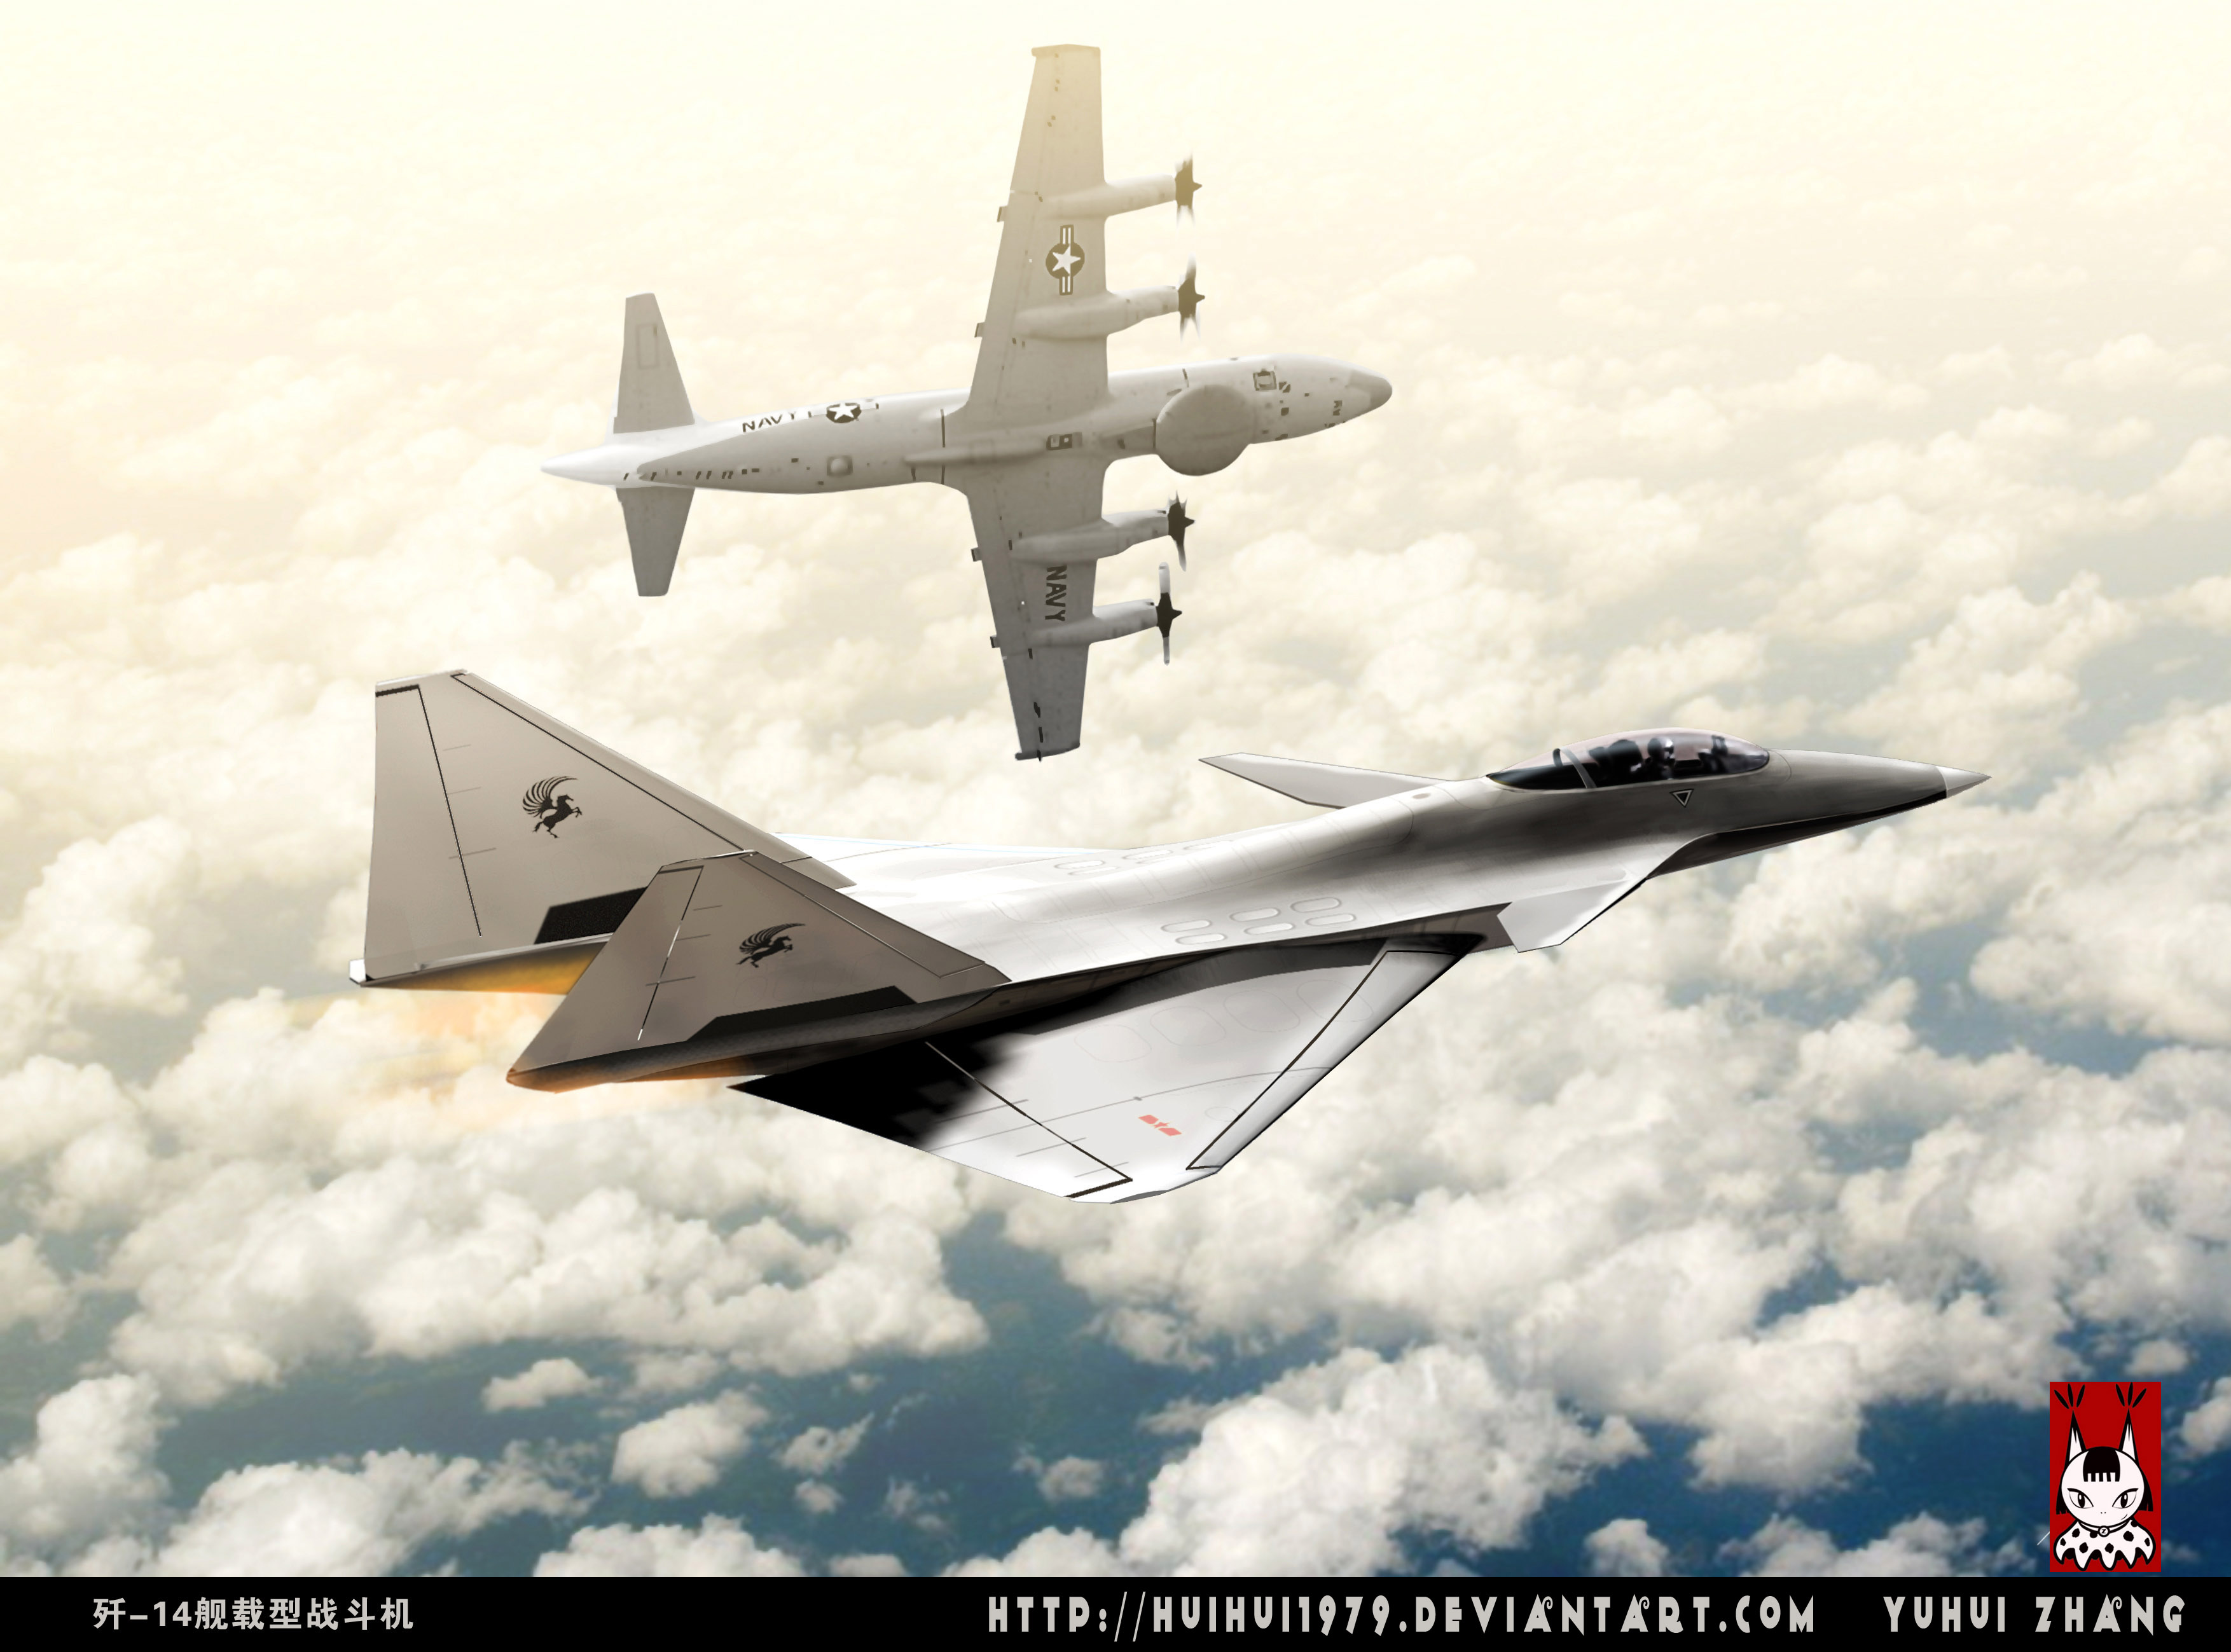 http://fc01.deviantart.net/fs21/f/2007/291/b/f/Chinese_J_14_Navy_fighter_owls_by_huihui1979.jpg